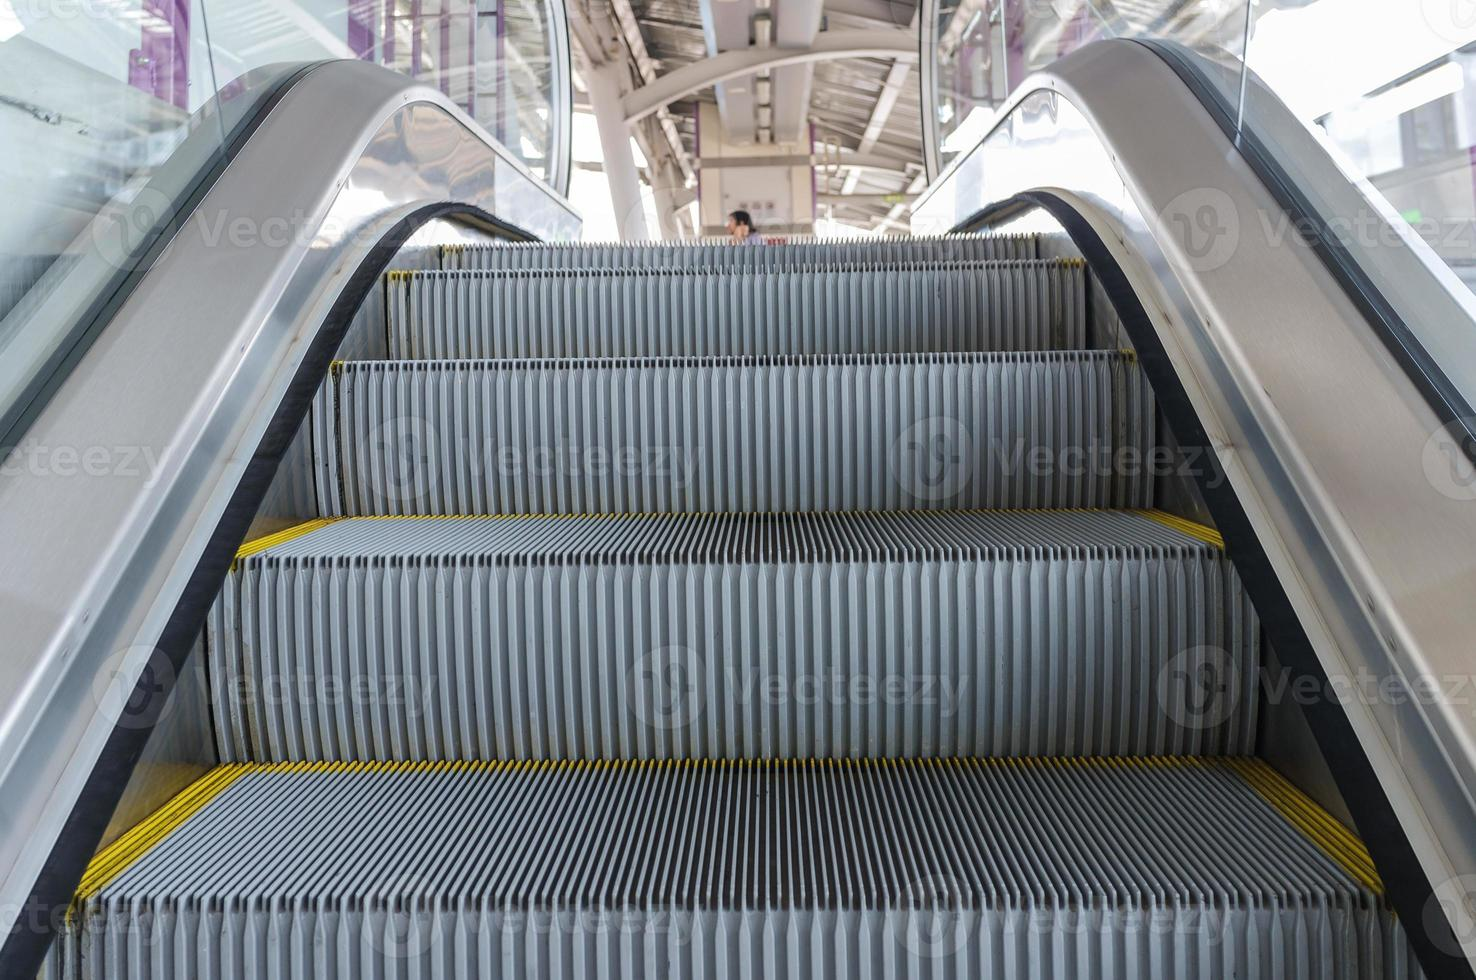 monter dans l'escalator photo